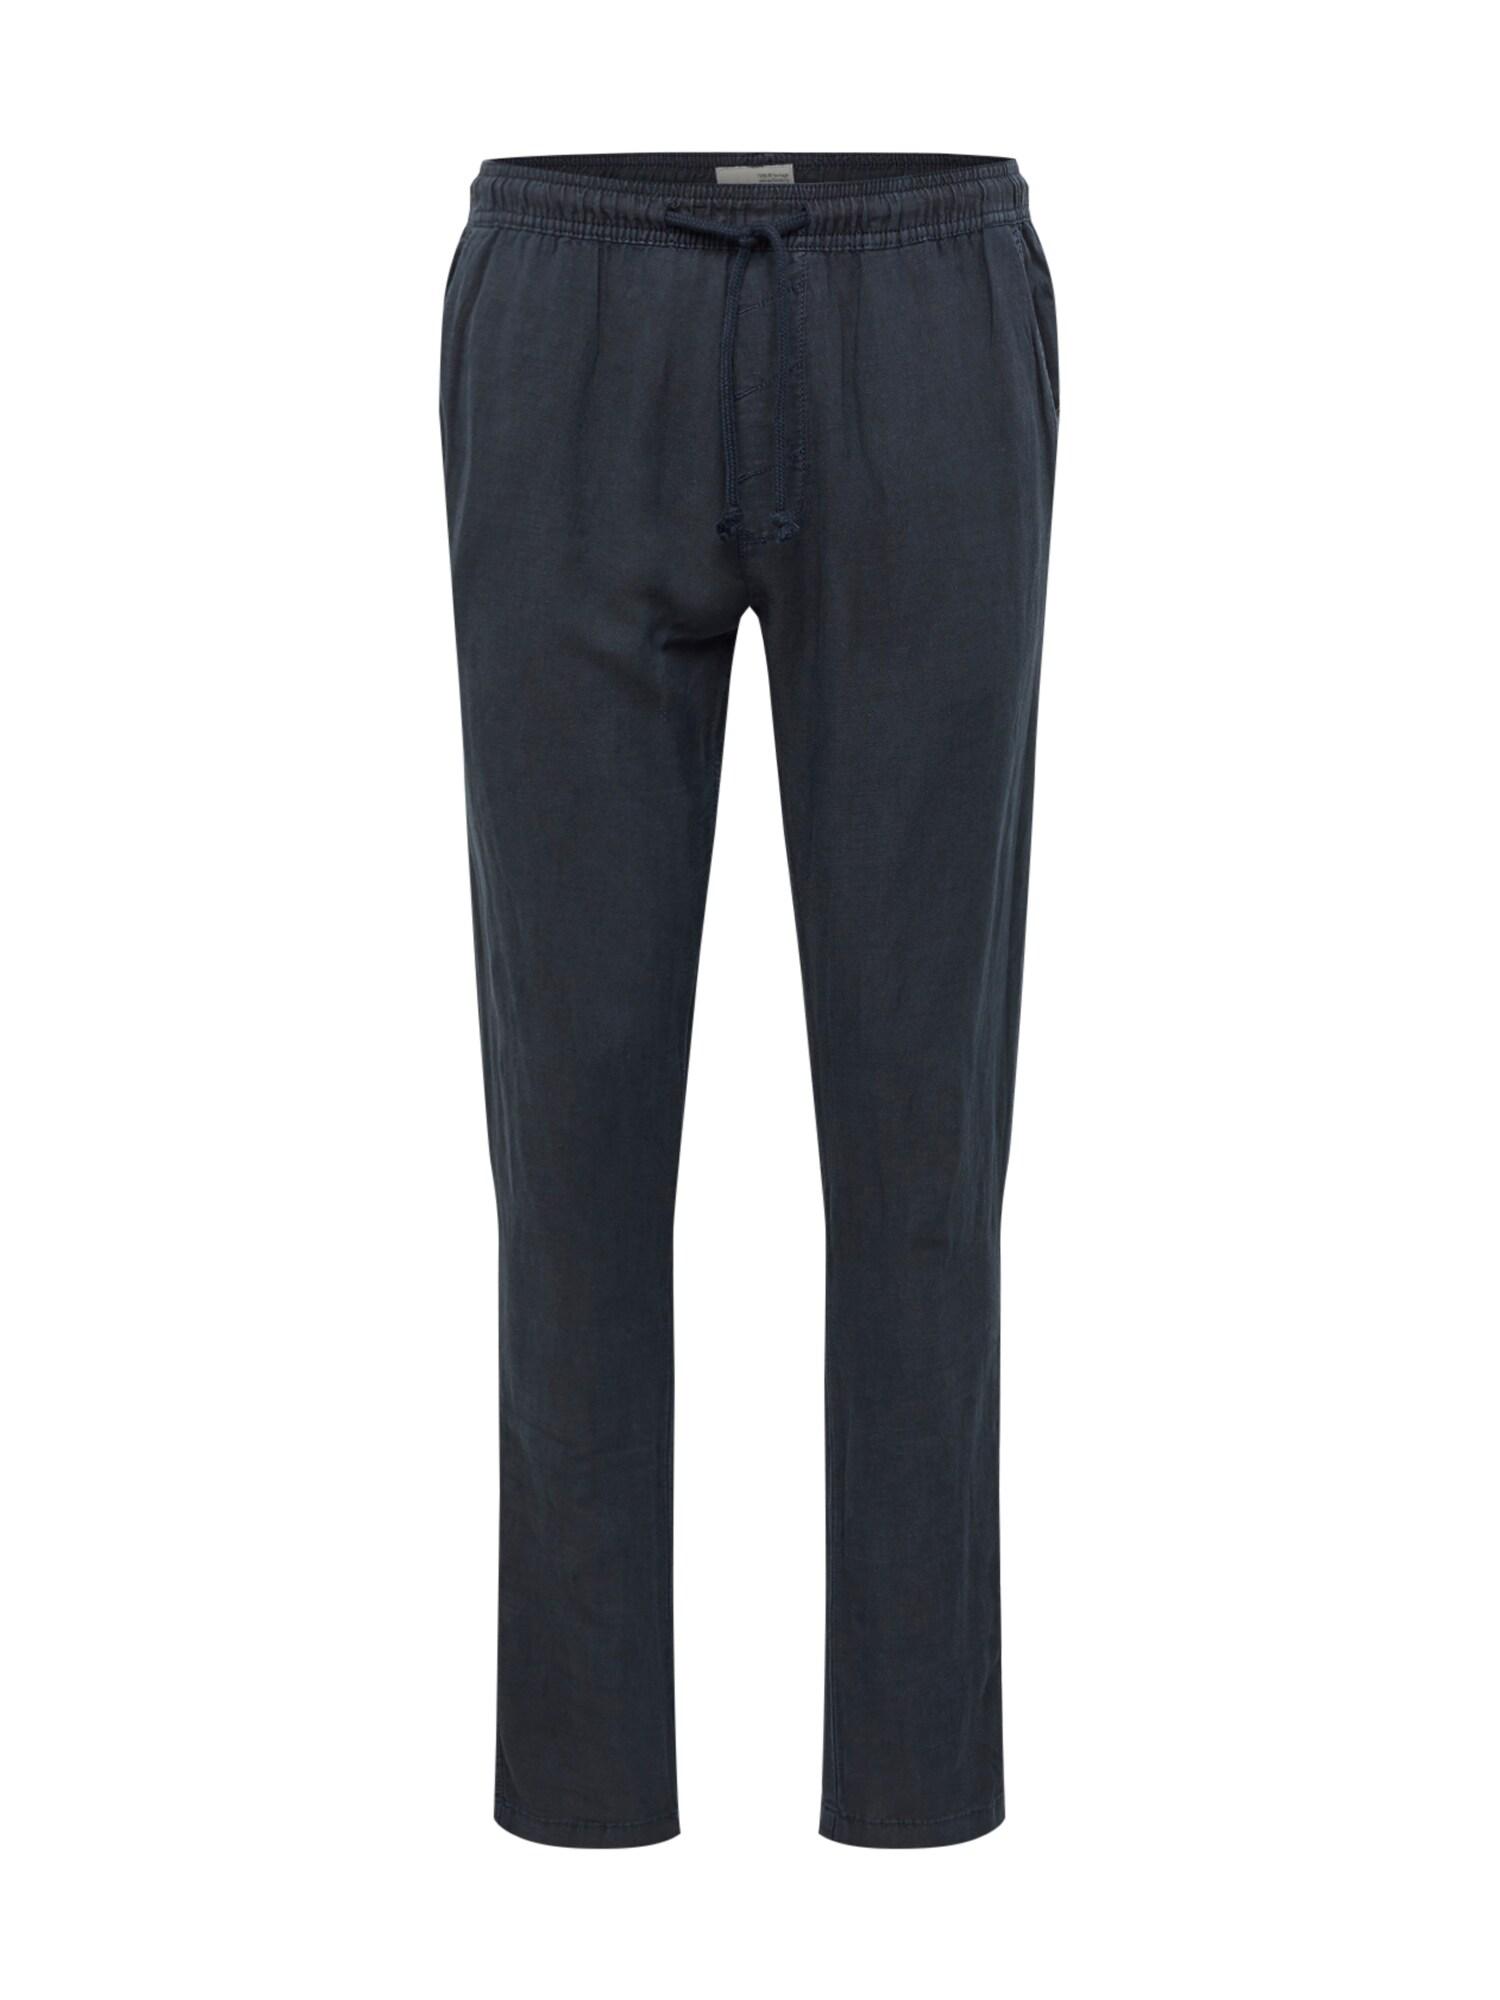 Kalhoty Slim-Truc tmavě modrá !Solid